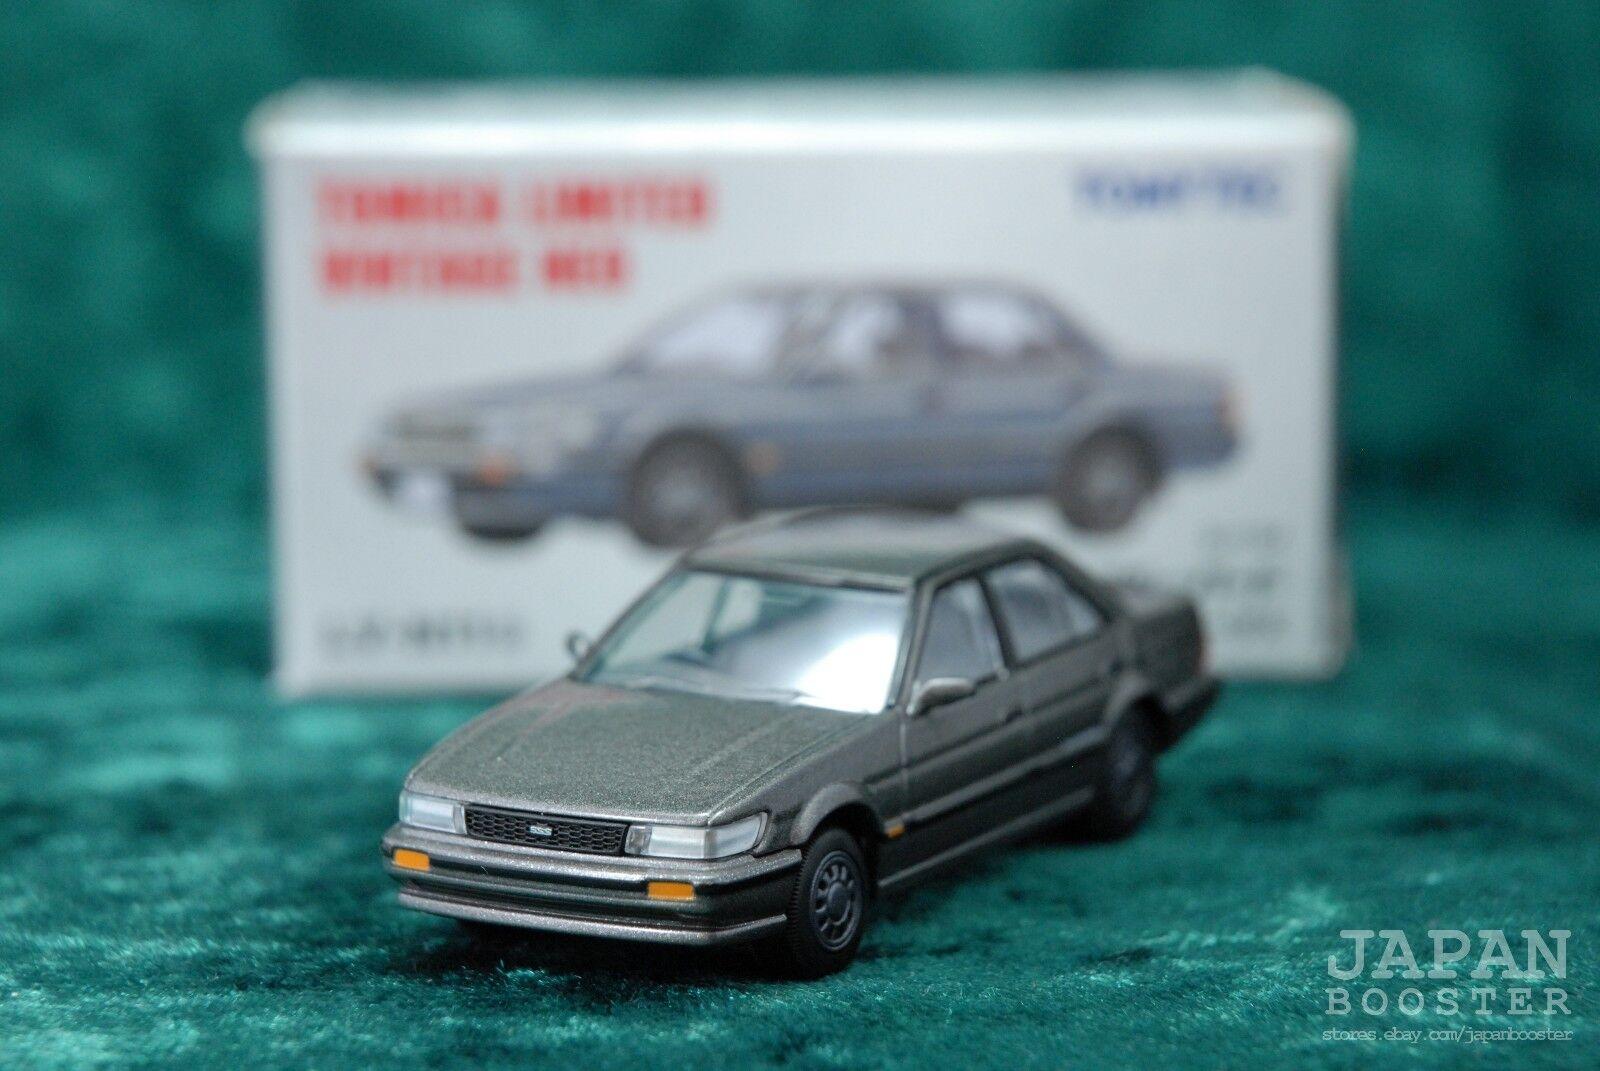 Tomytec Tomica Limited Vintage Neo Nissan Bluebird 2 0 Sss Atessa X Mini Car For Sale Online Ebay